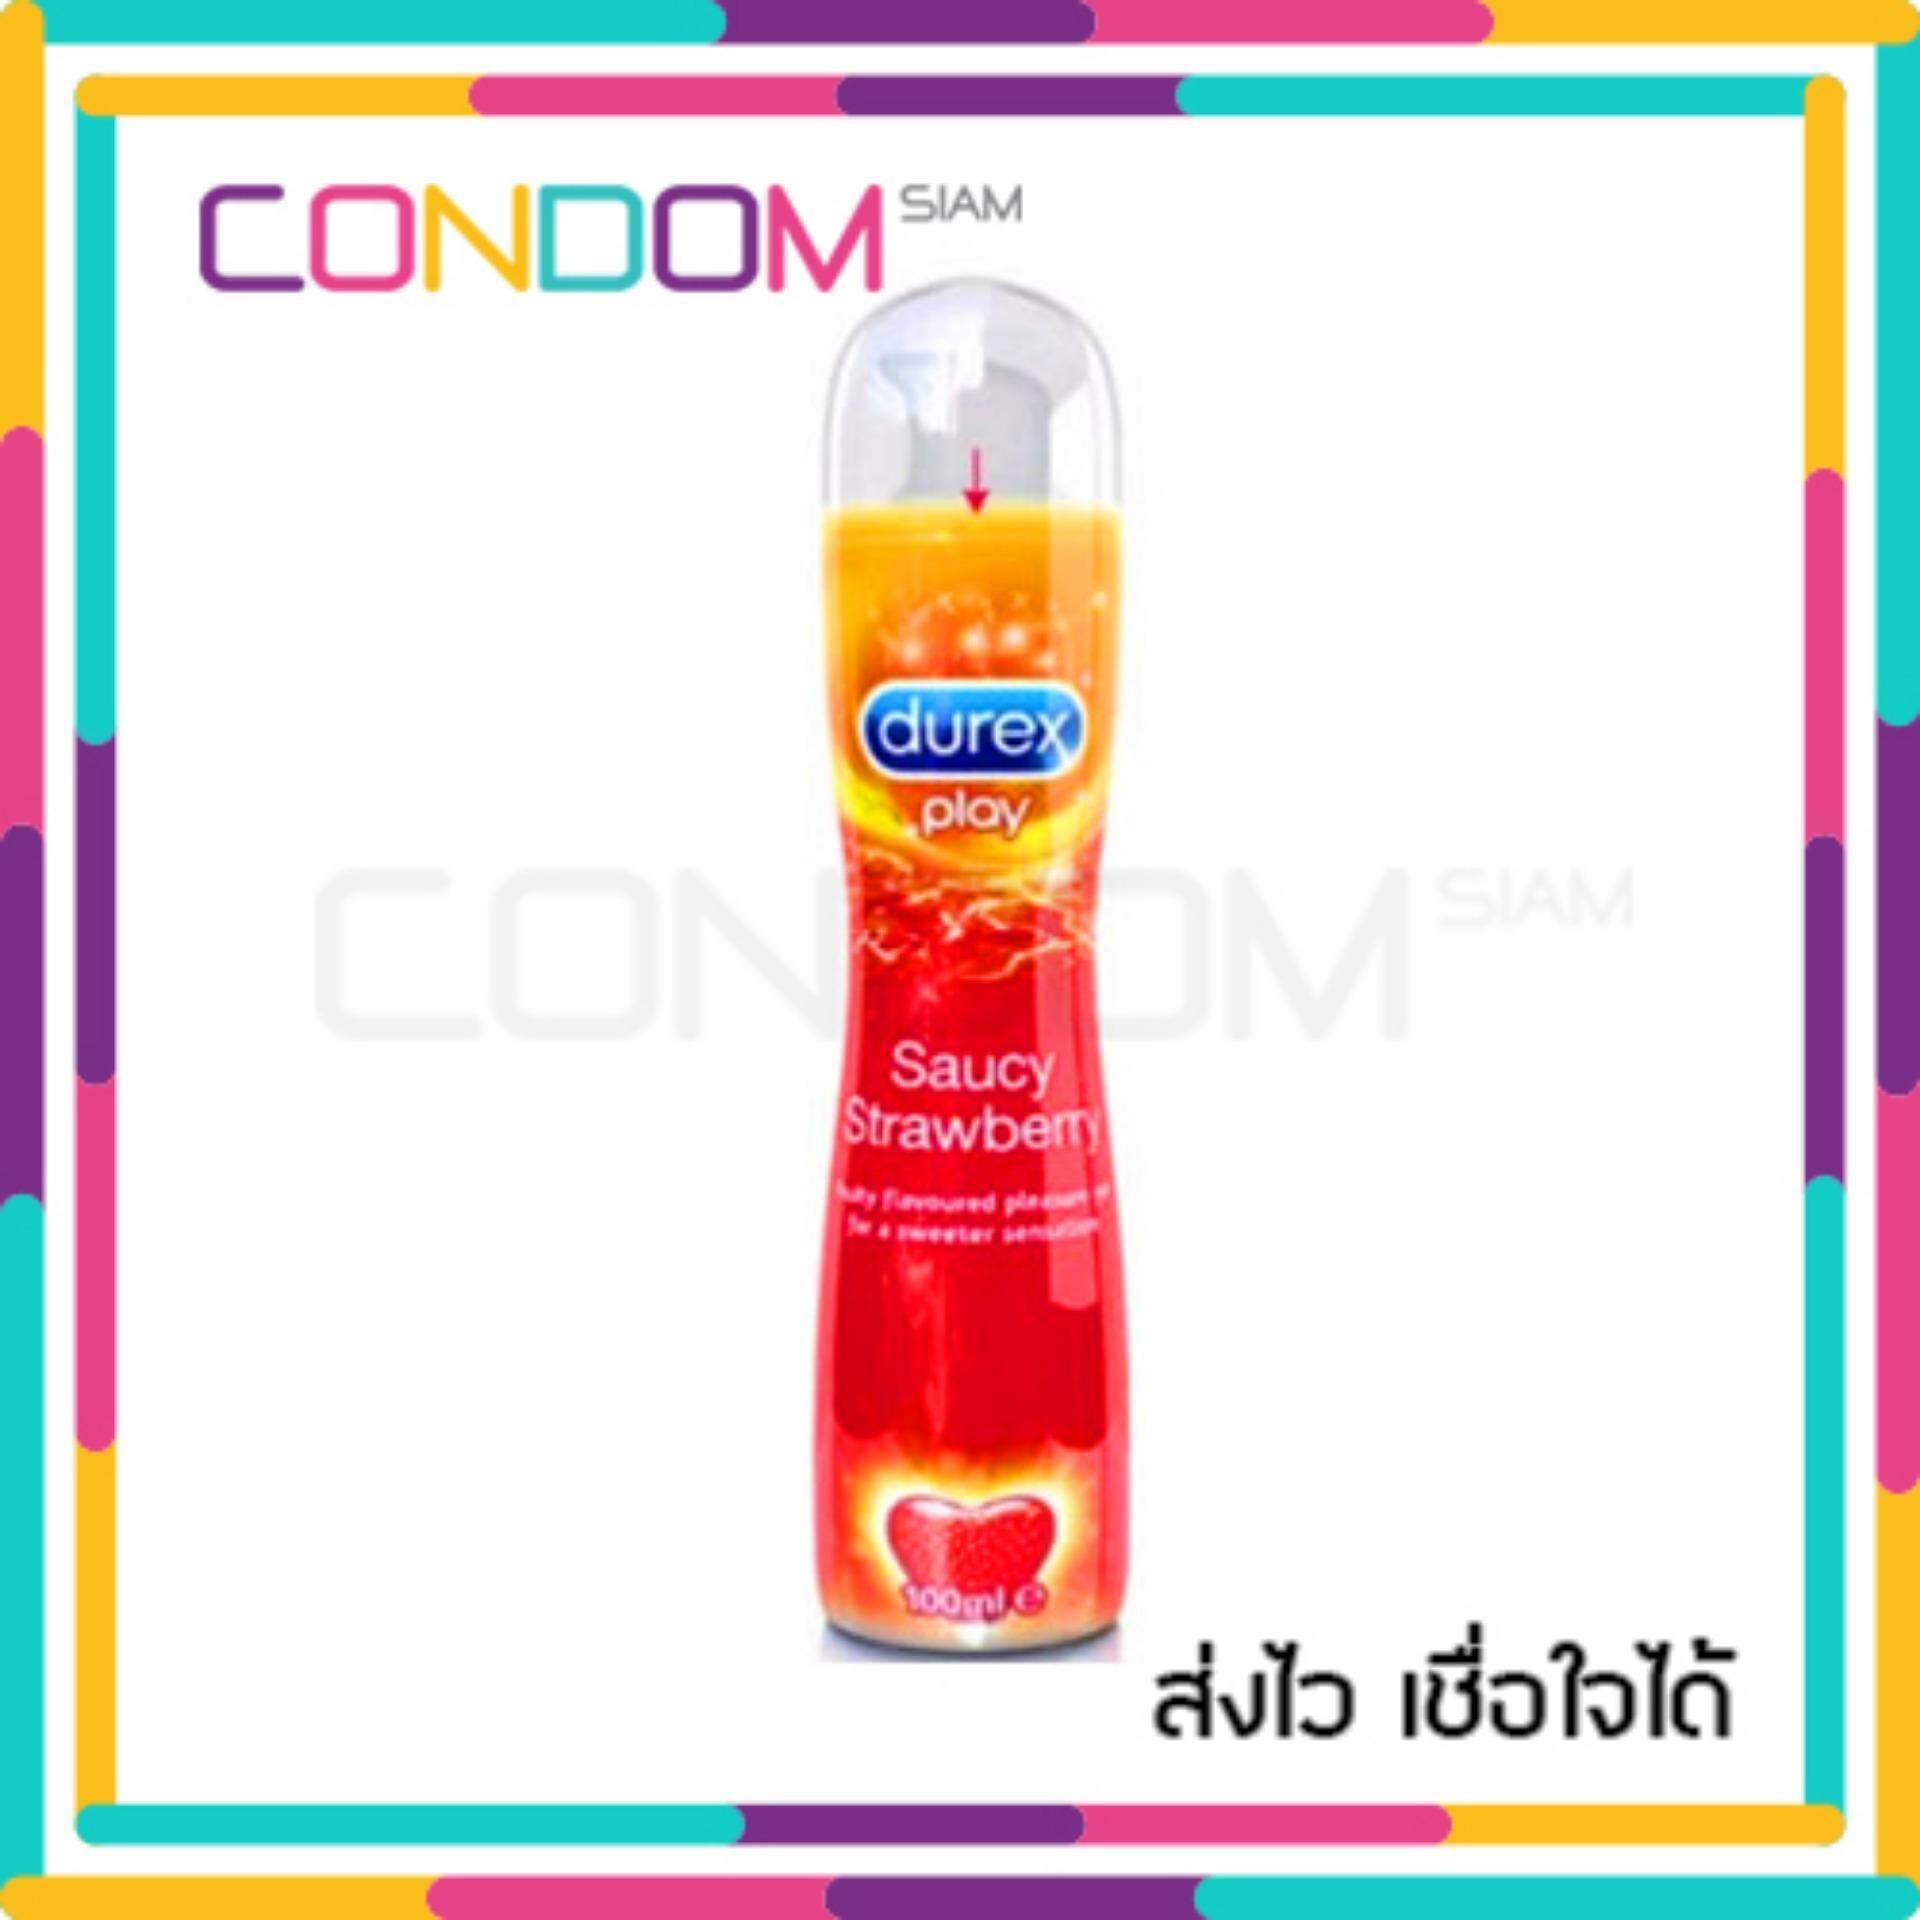 Durex Play Strawberry 100 Ml (ดูเร็กซ์ เพลย์ สตอเบอรี่ หอม นาน ) By Condomsiam.